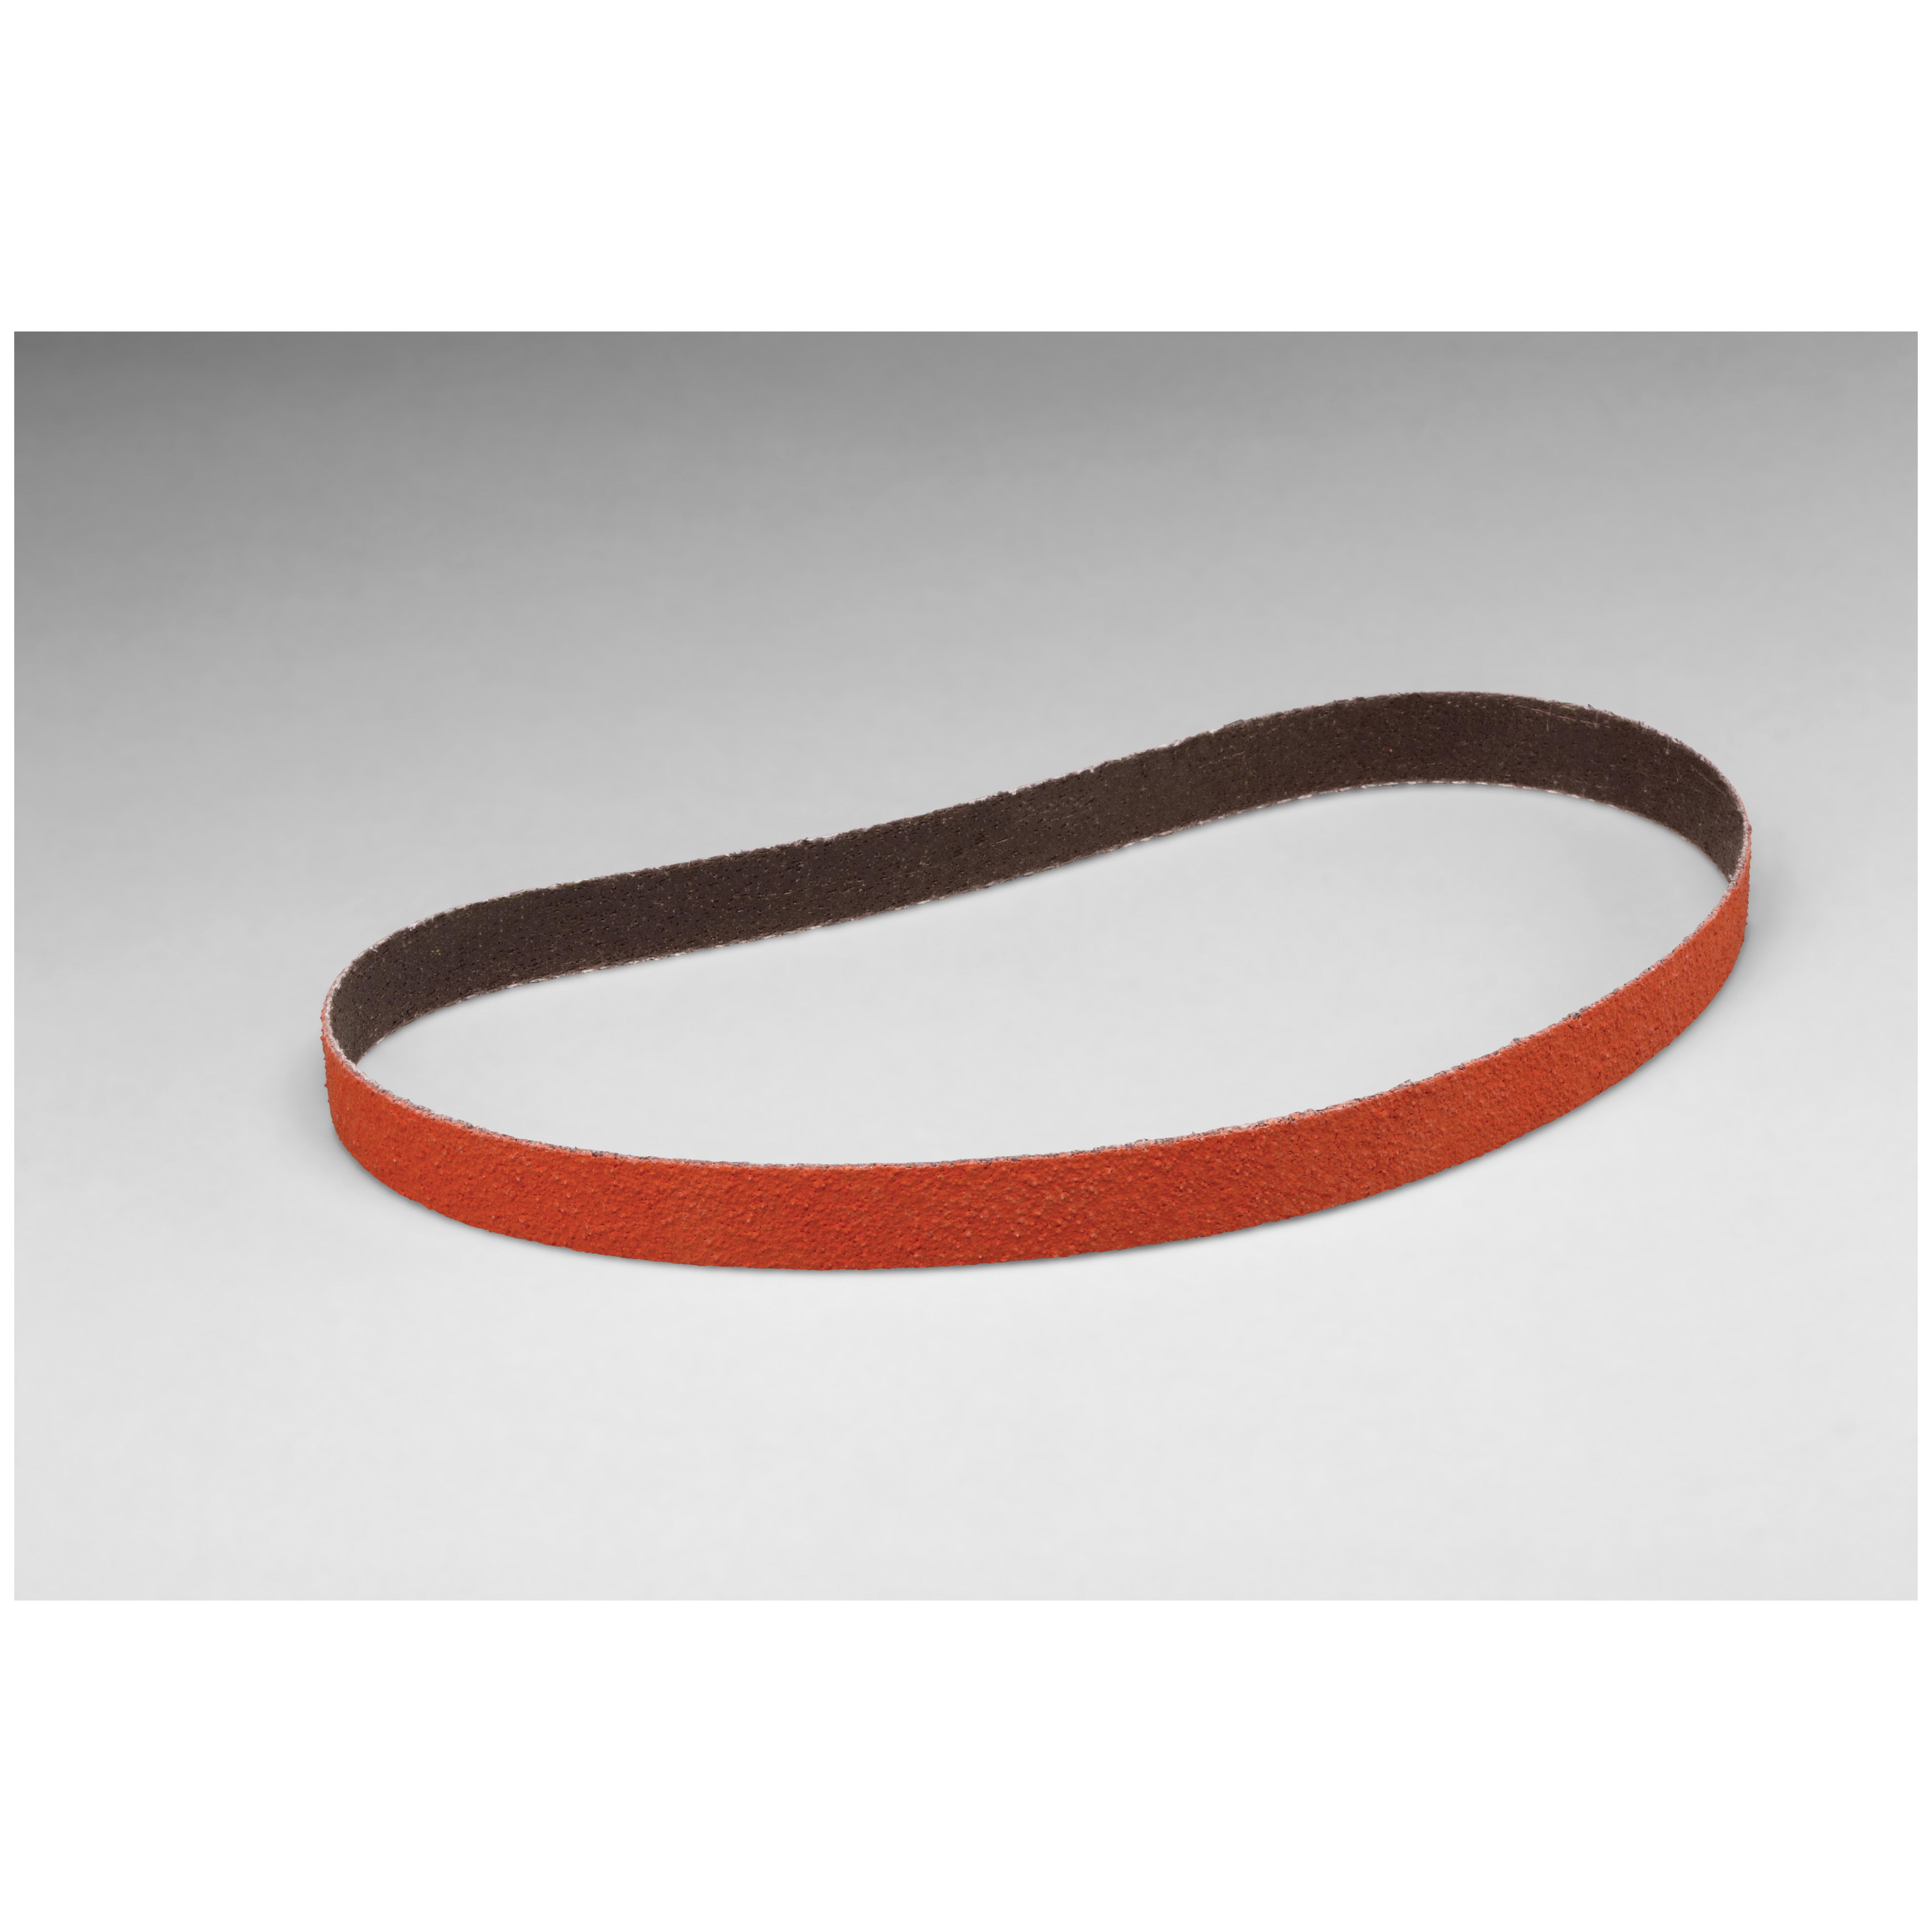 Cubitron™ 051111-68619 977F Narrow Abrasive Belt, 4 in W x 132 in L, 80 Grit, Ceramic Abrasive, Polyester Backing